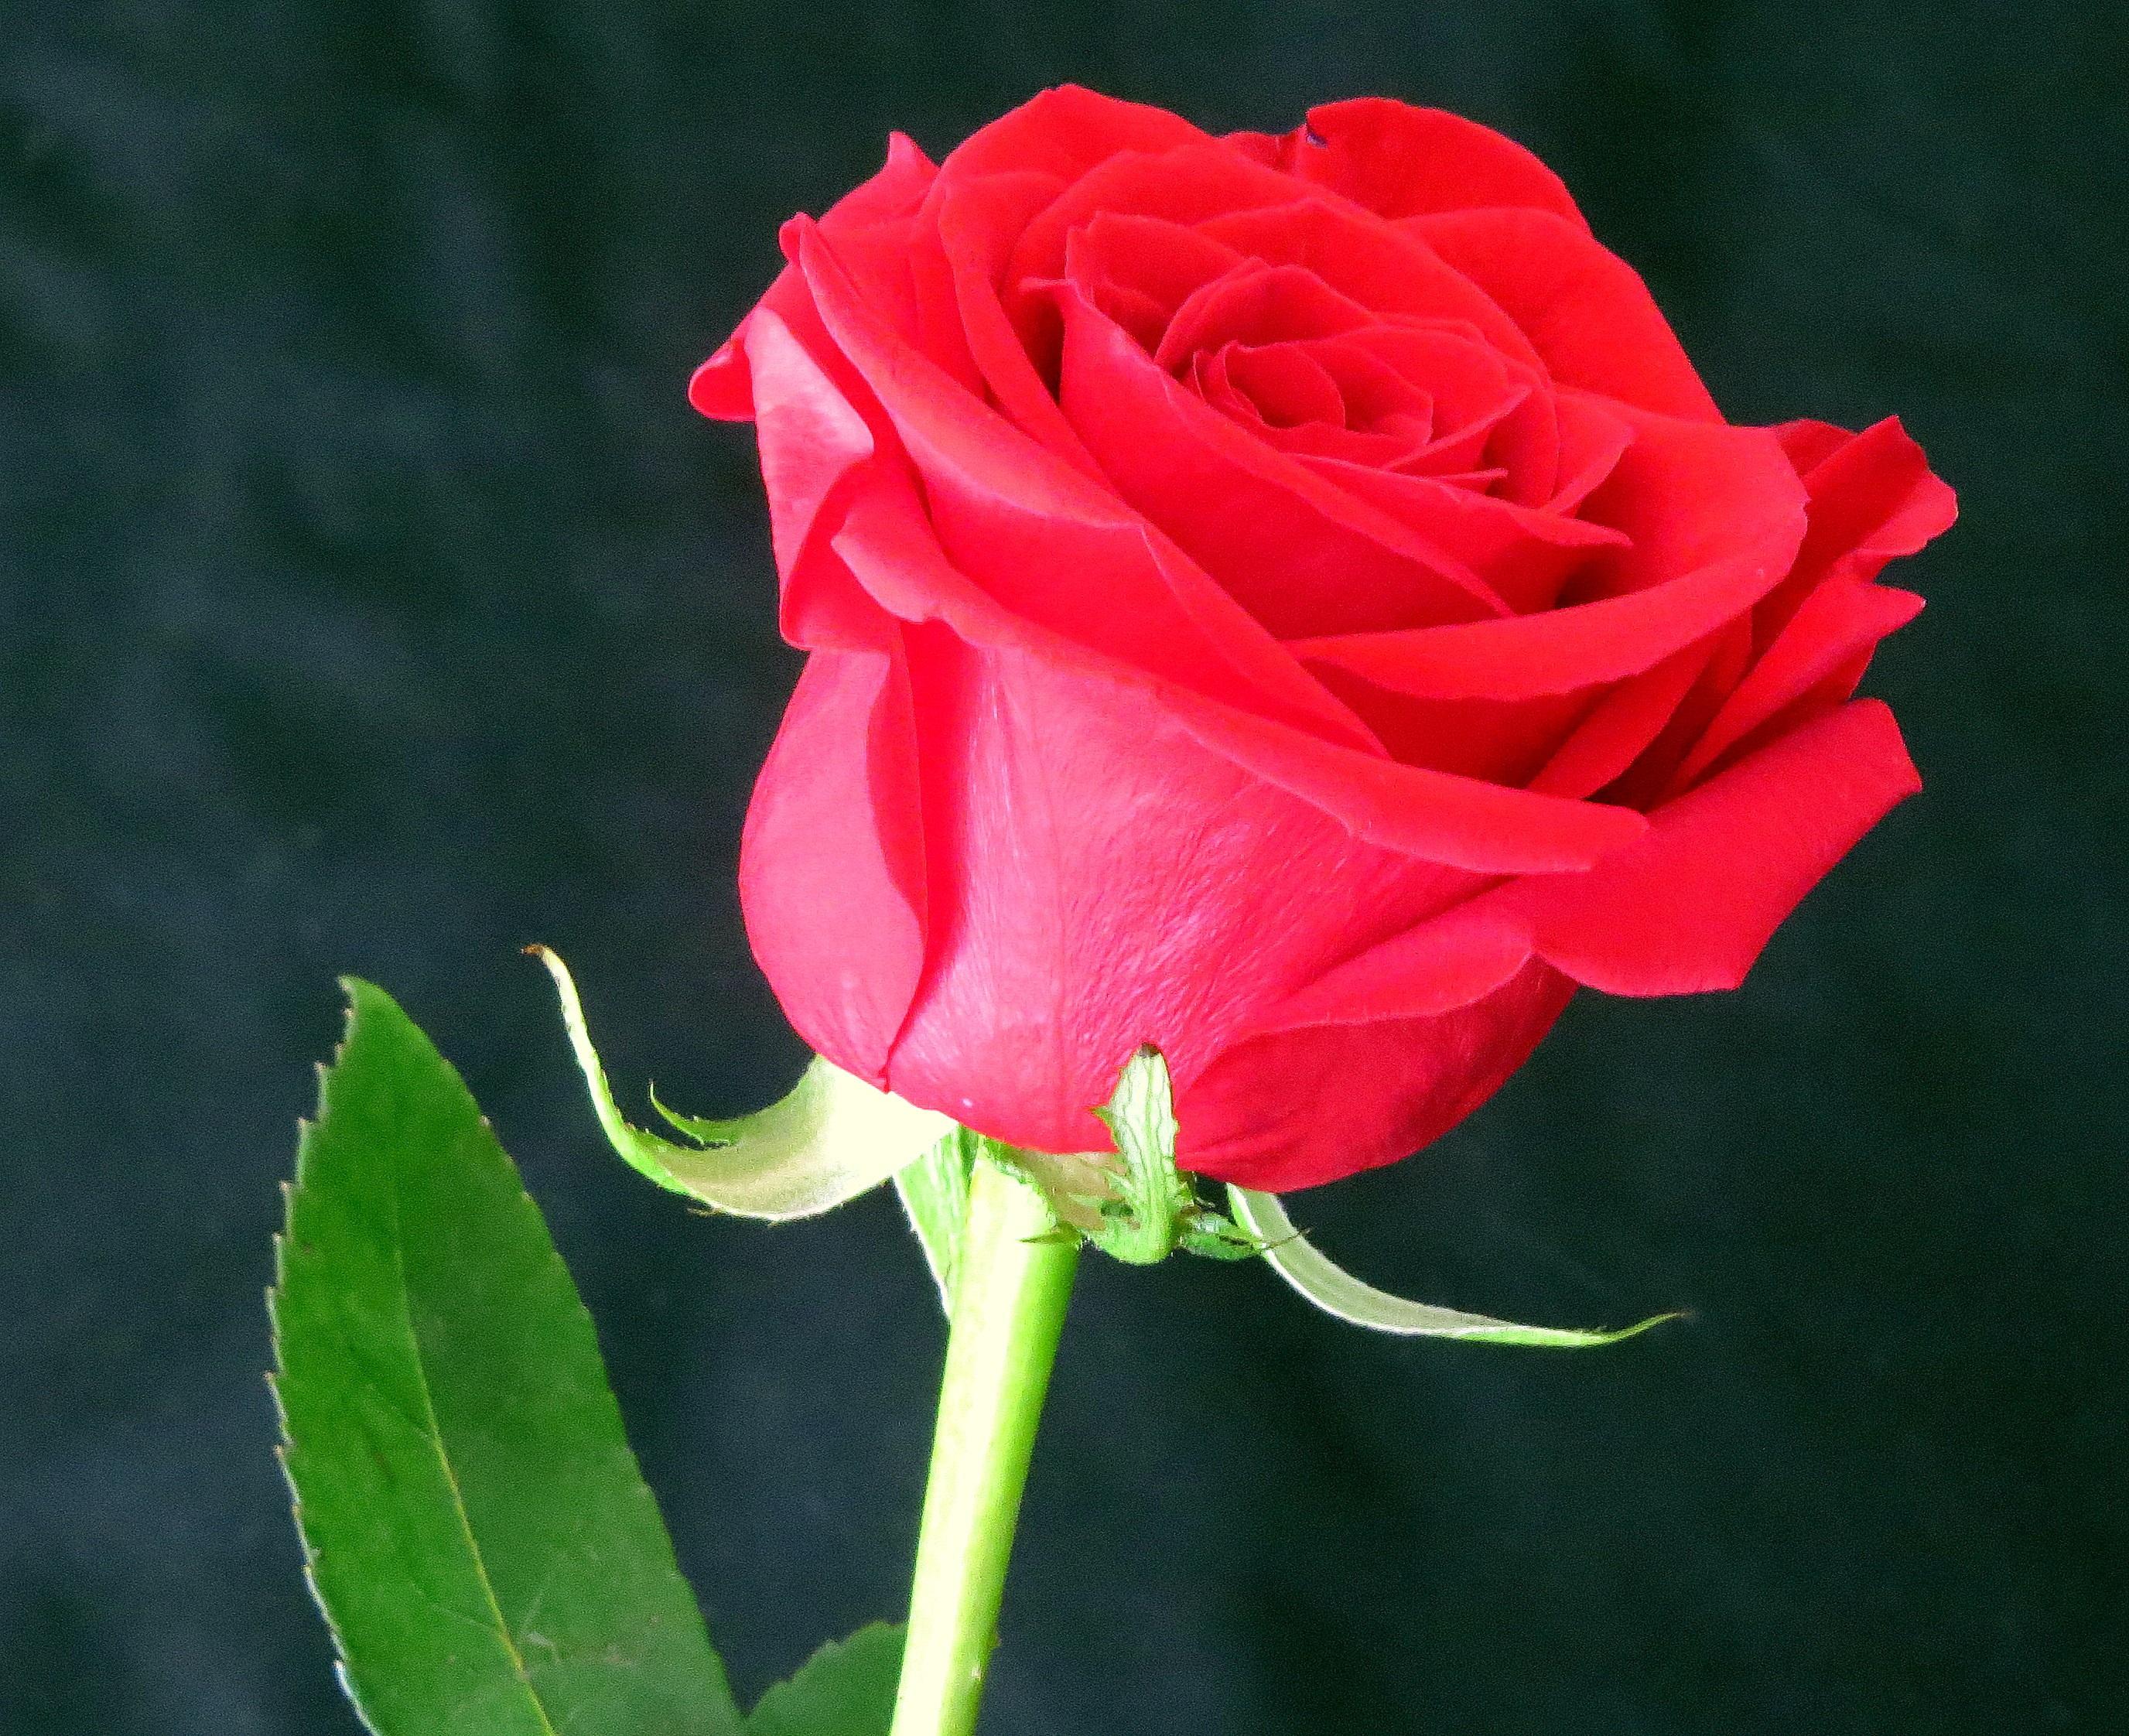 Free Images Flower Petal Red Rose Floribunda Macro Photography